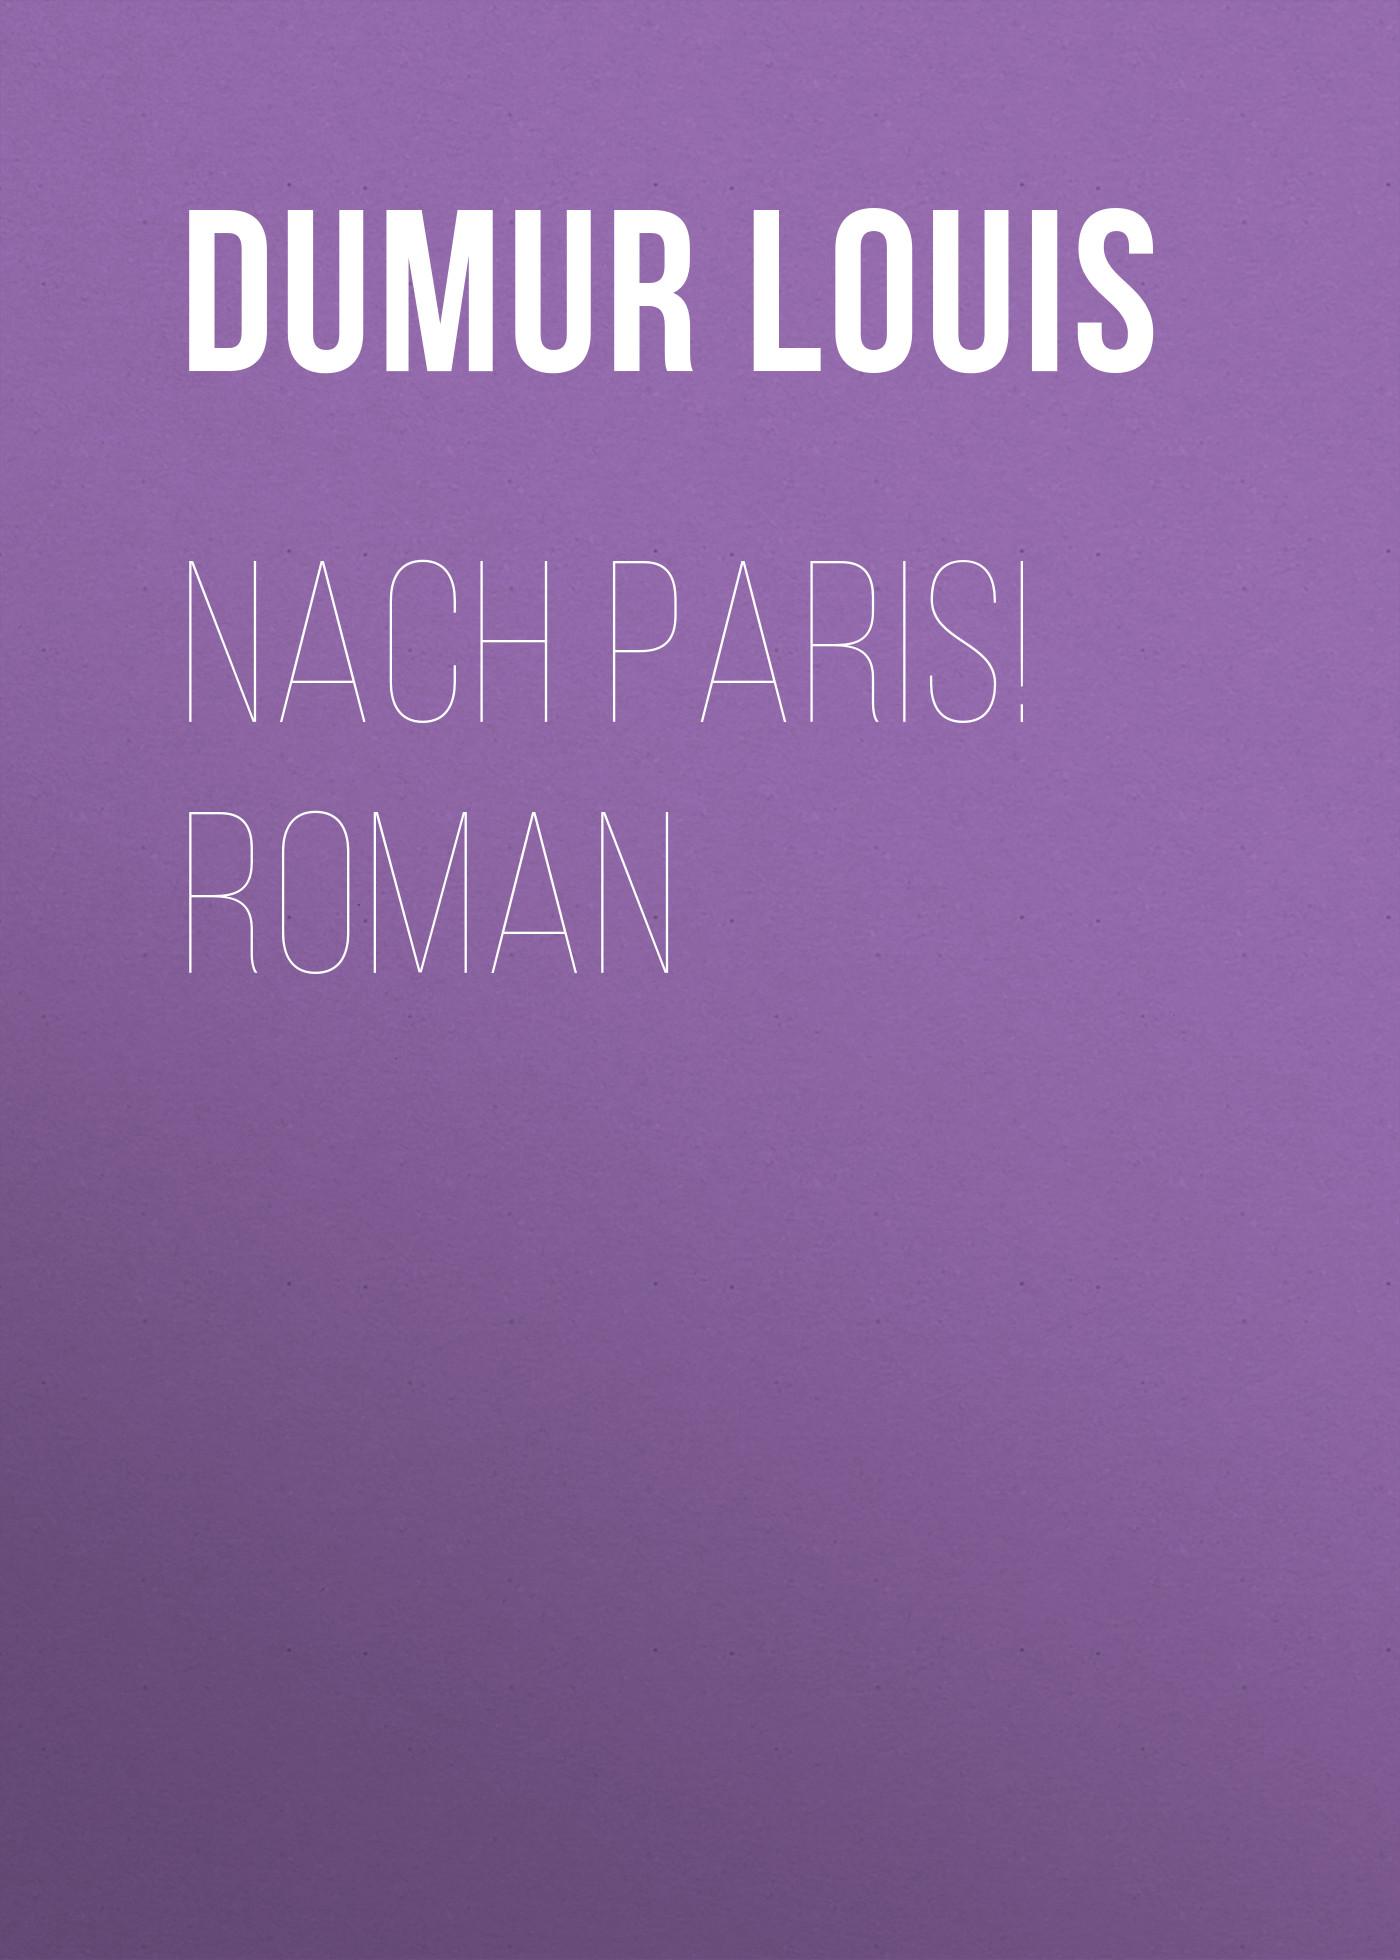 Dumur Louis Nach Paris! Roman nach dinner bell